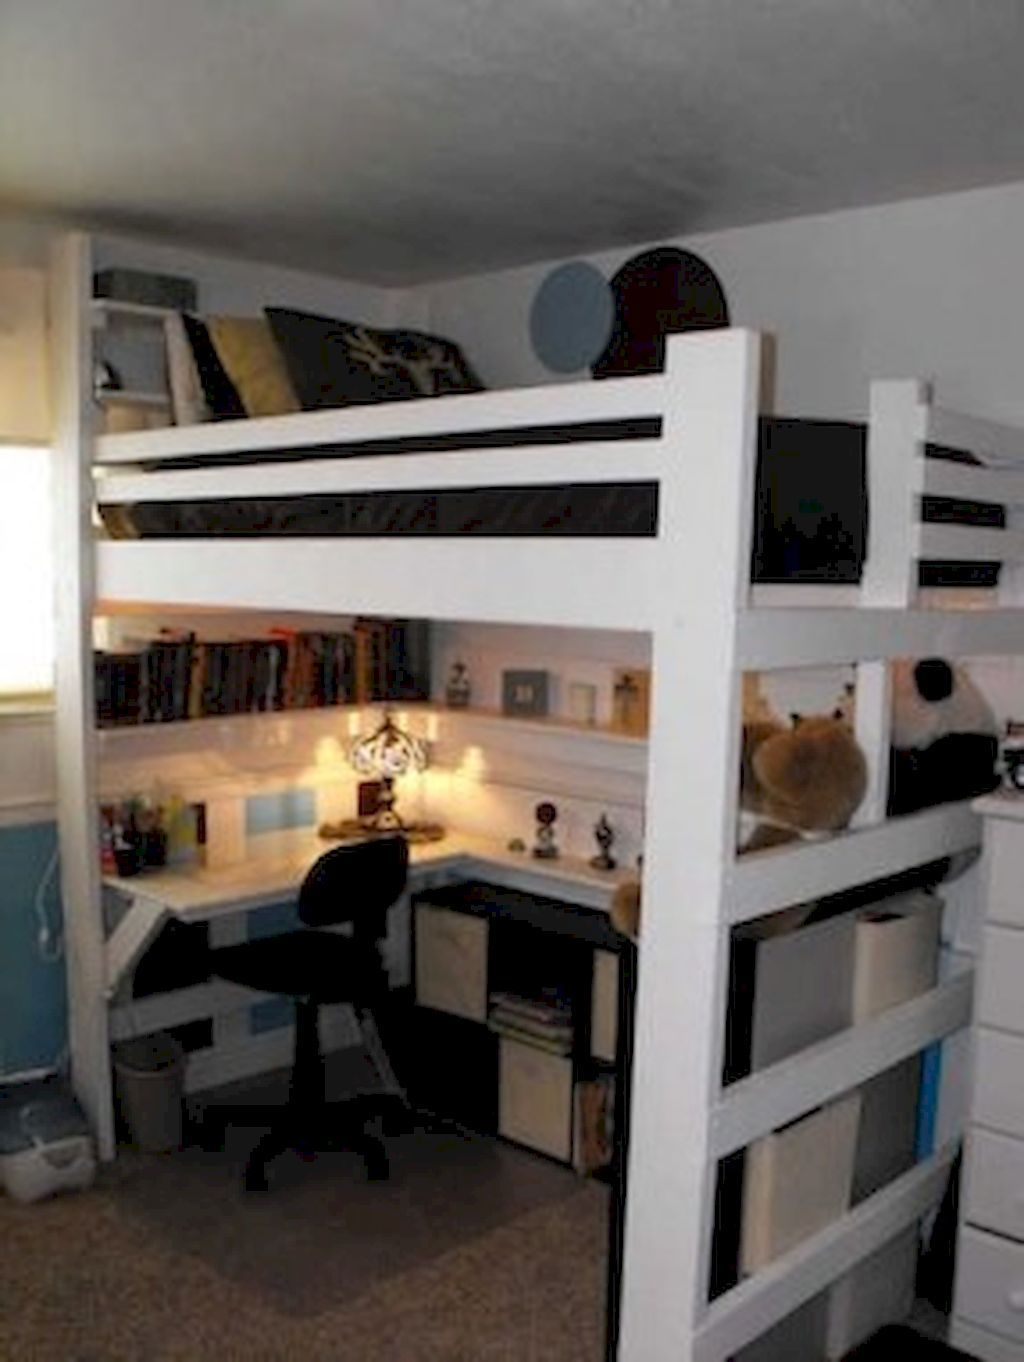 College dorm loft bed ideas   Cute Loft Beds College Dorm Room Design Ideas For Girl  Dorm